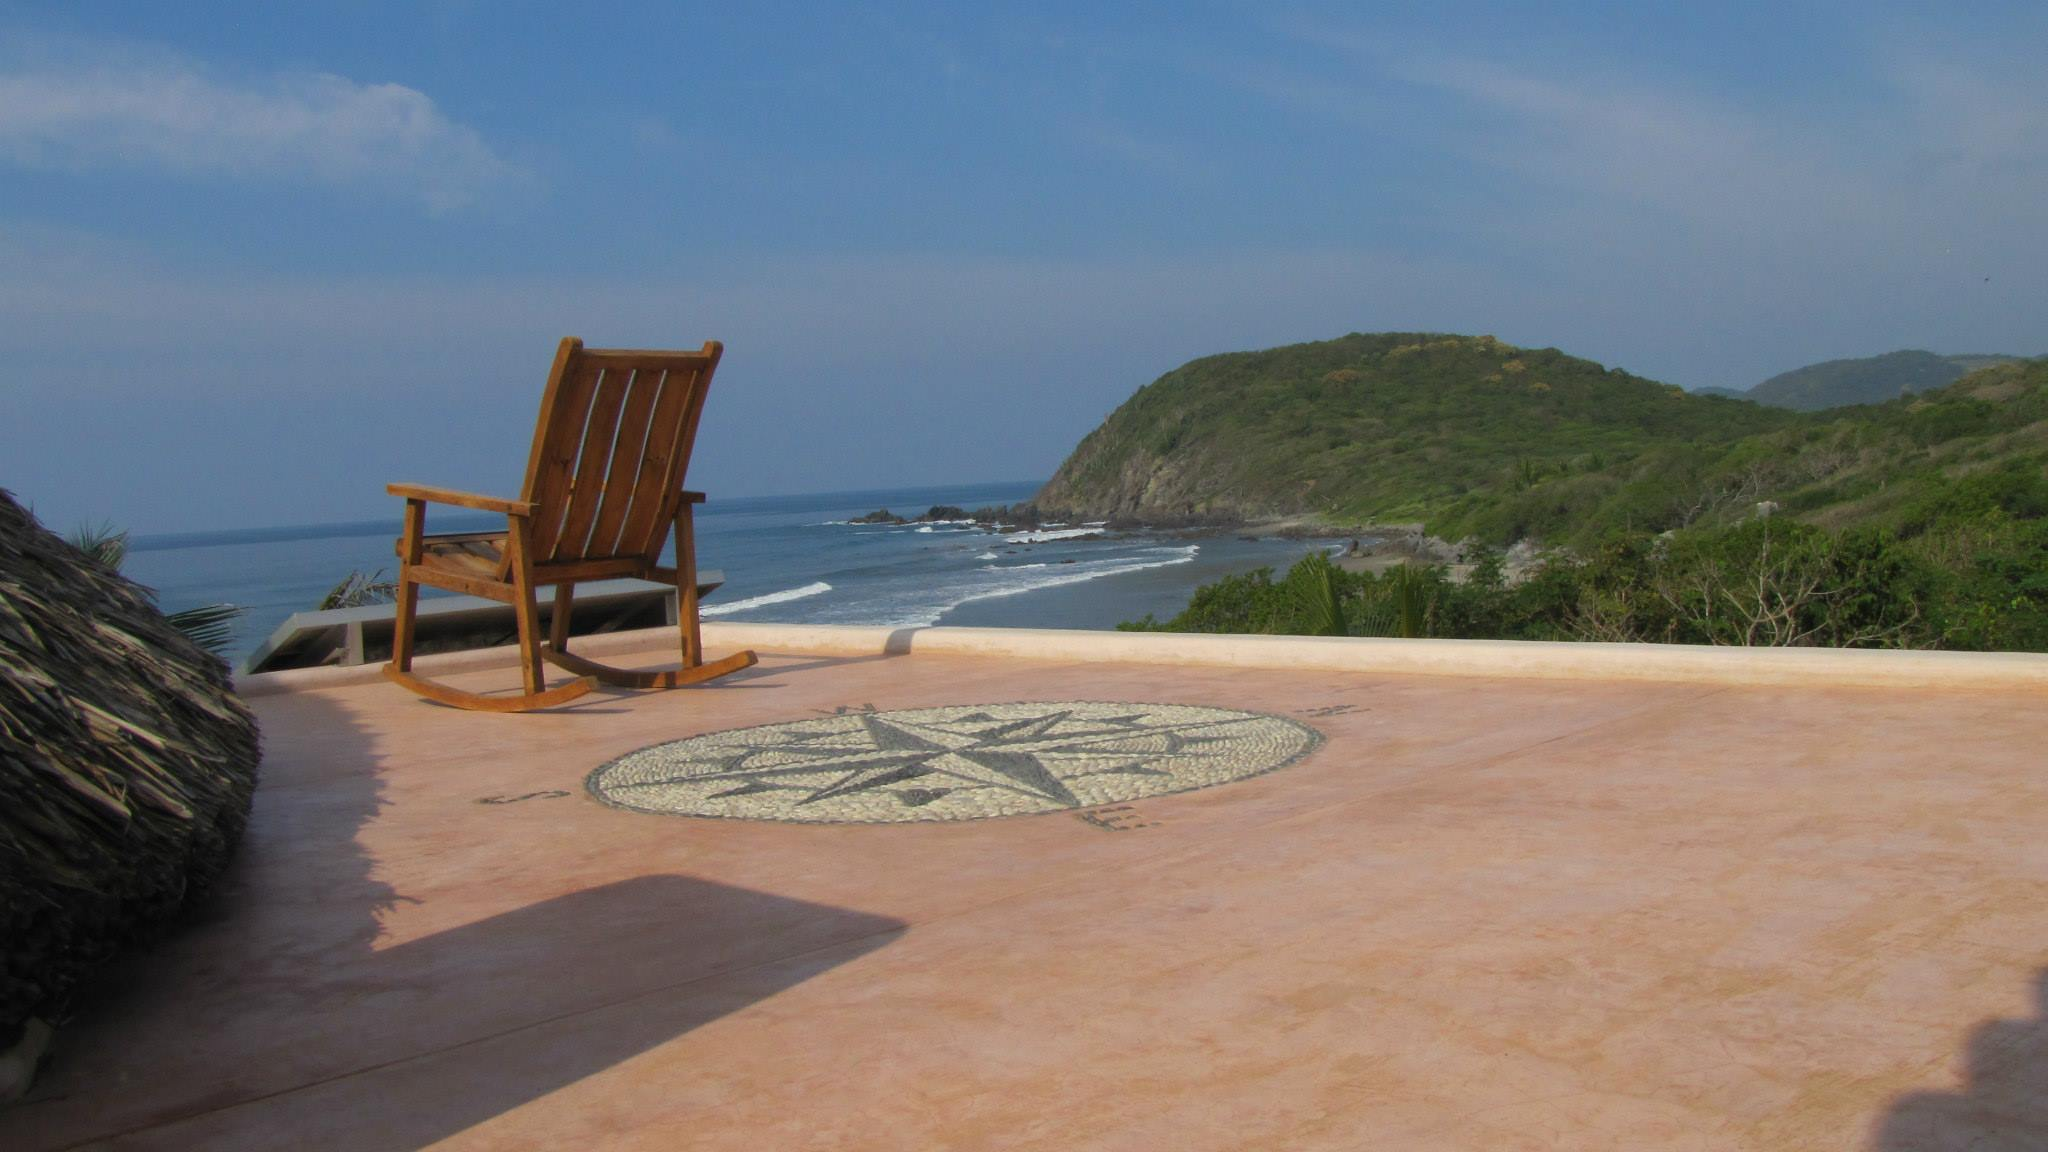 discover troncones saladita majahua mexico playa reservaciones hospedaje ixtapa guerrero travel near me booking hotel cheap hotel beach chair